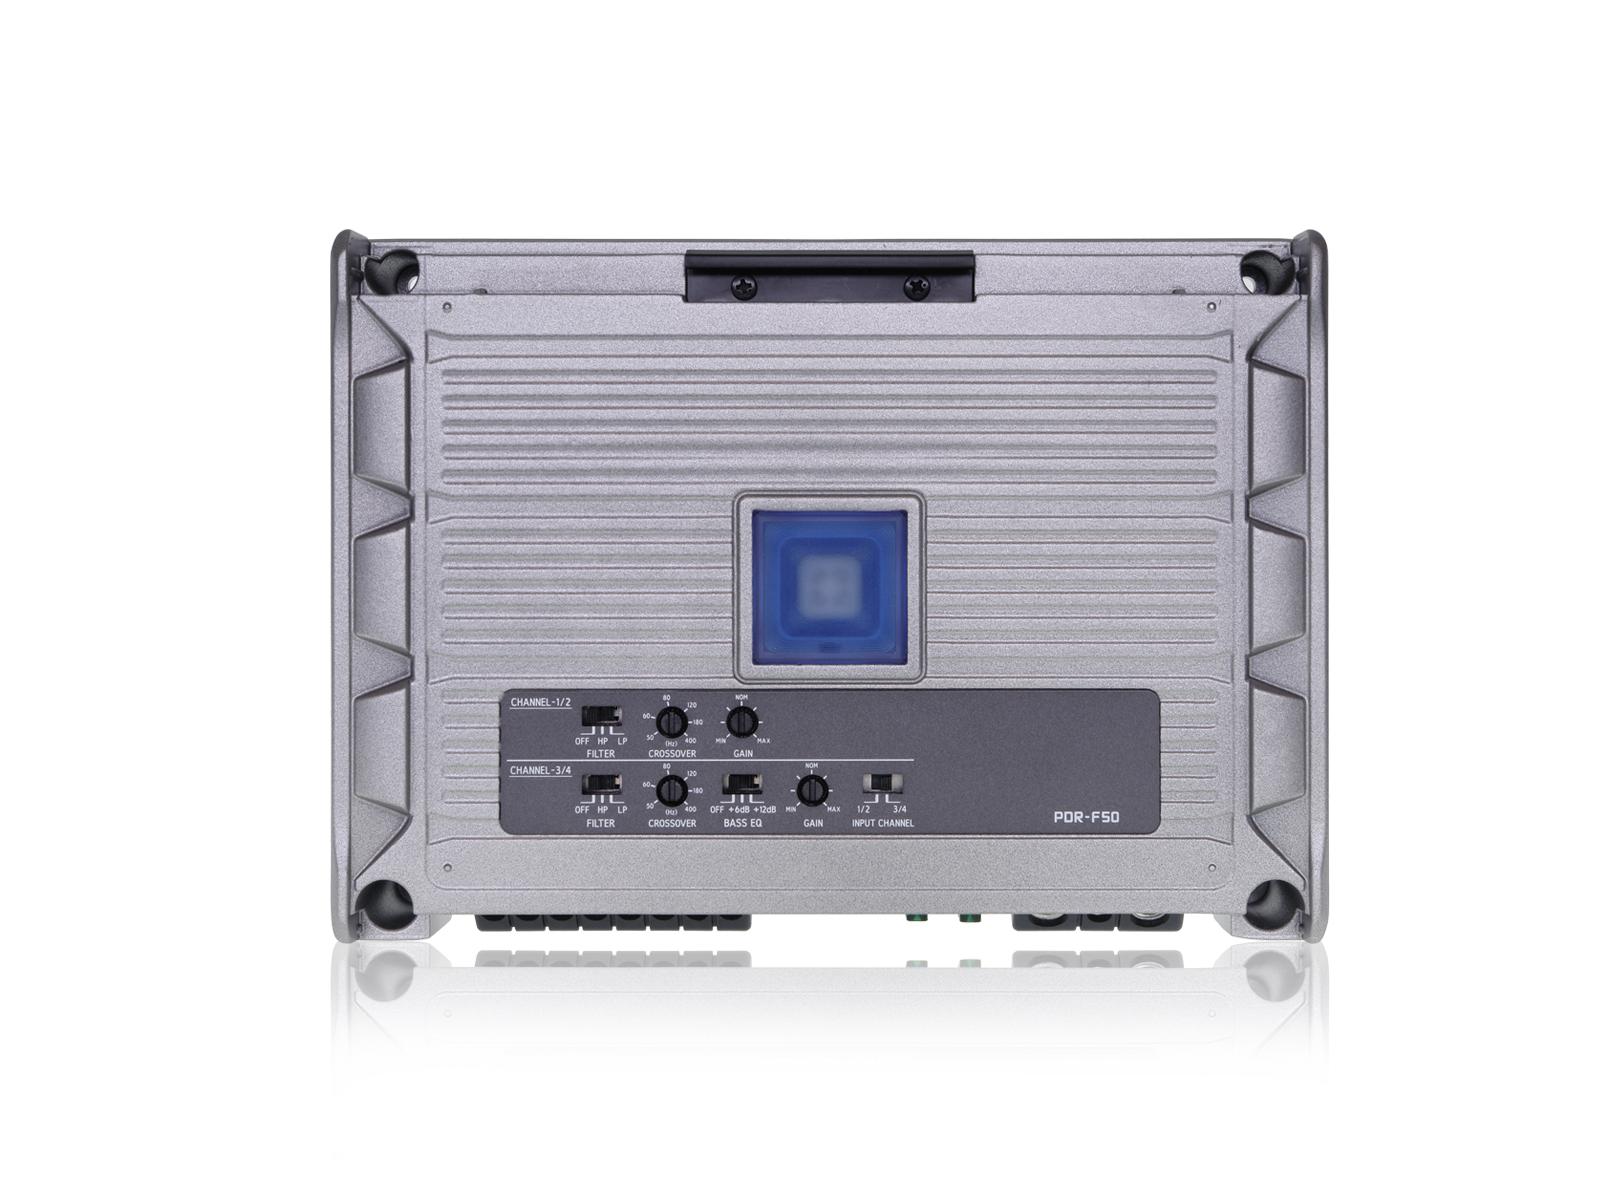 4 Channel Power Amplifier Alpine Pdr F50 Szx1302 Subwoofer Lowpass Circuit Board Free